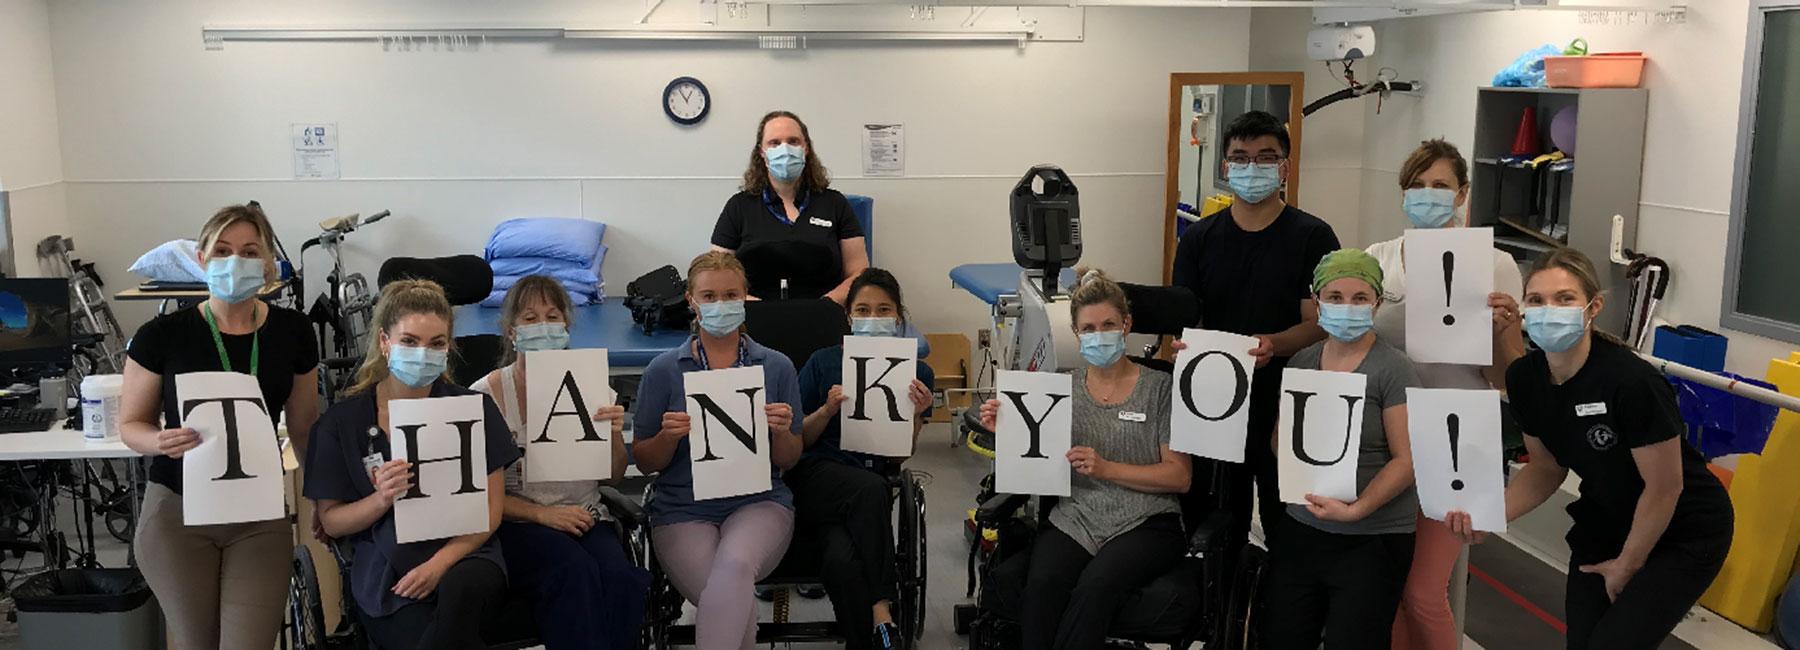 Rehab Department Receives Bariatric Wheelchairs